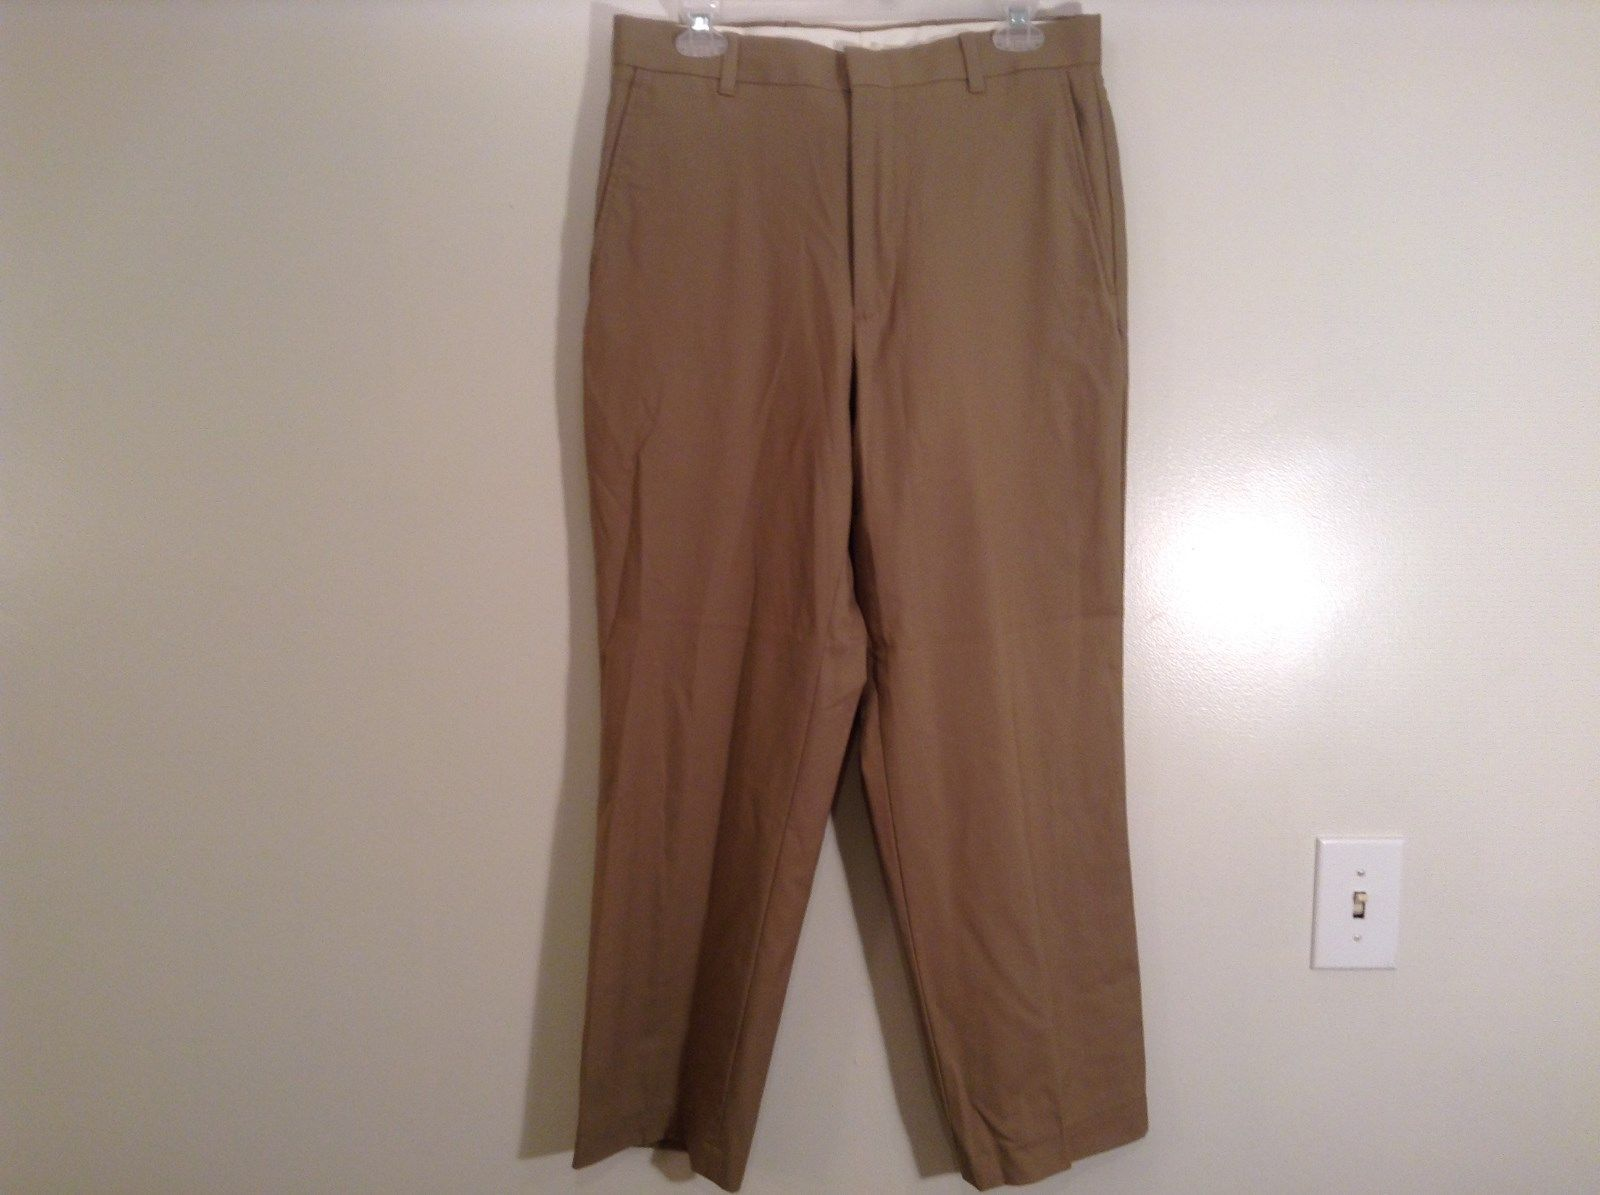 Tan Classic Fit L L Bean Flat Front Wool Dress Pants Size 32W High Quality